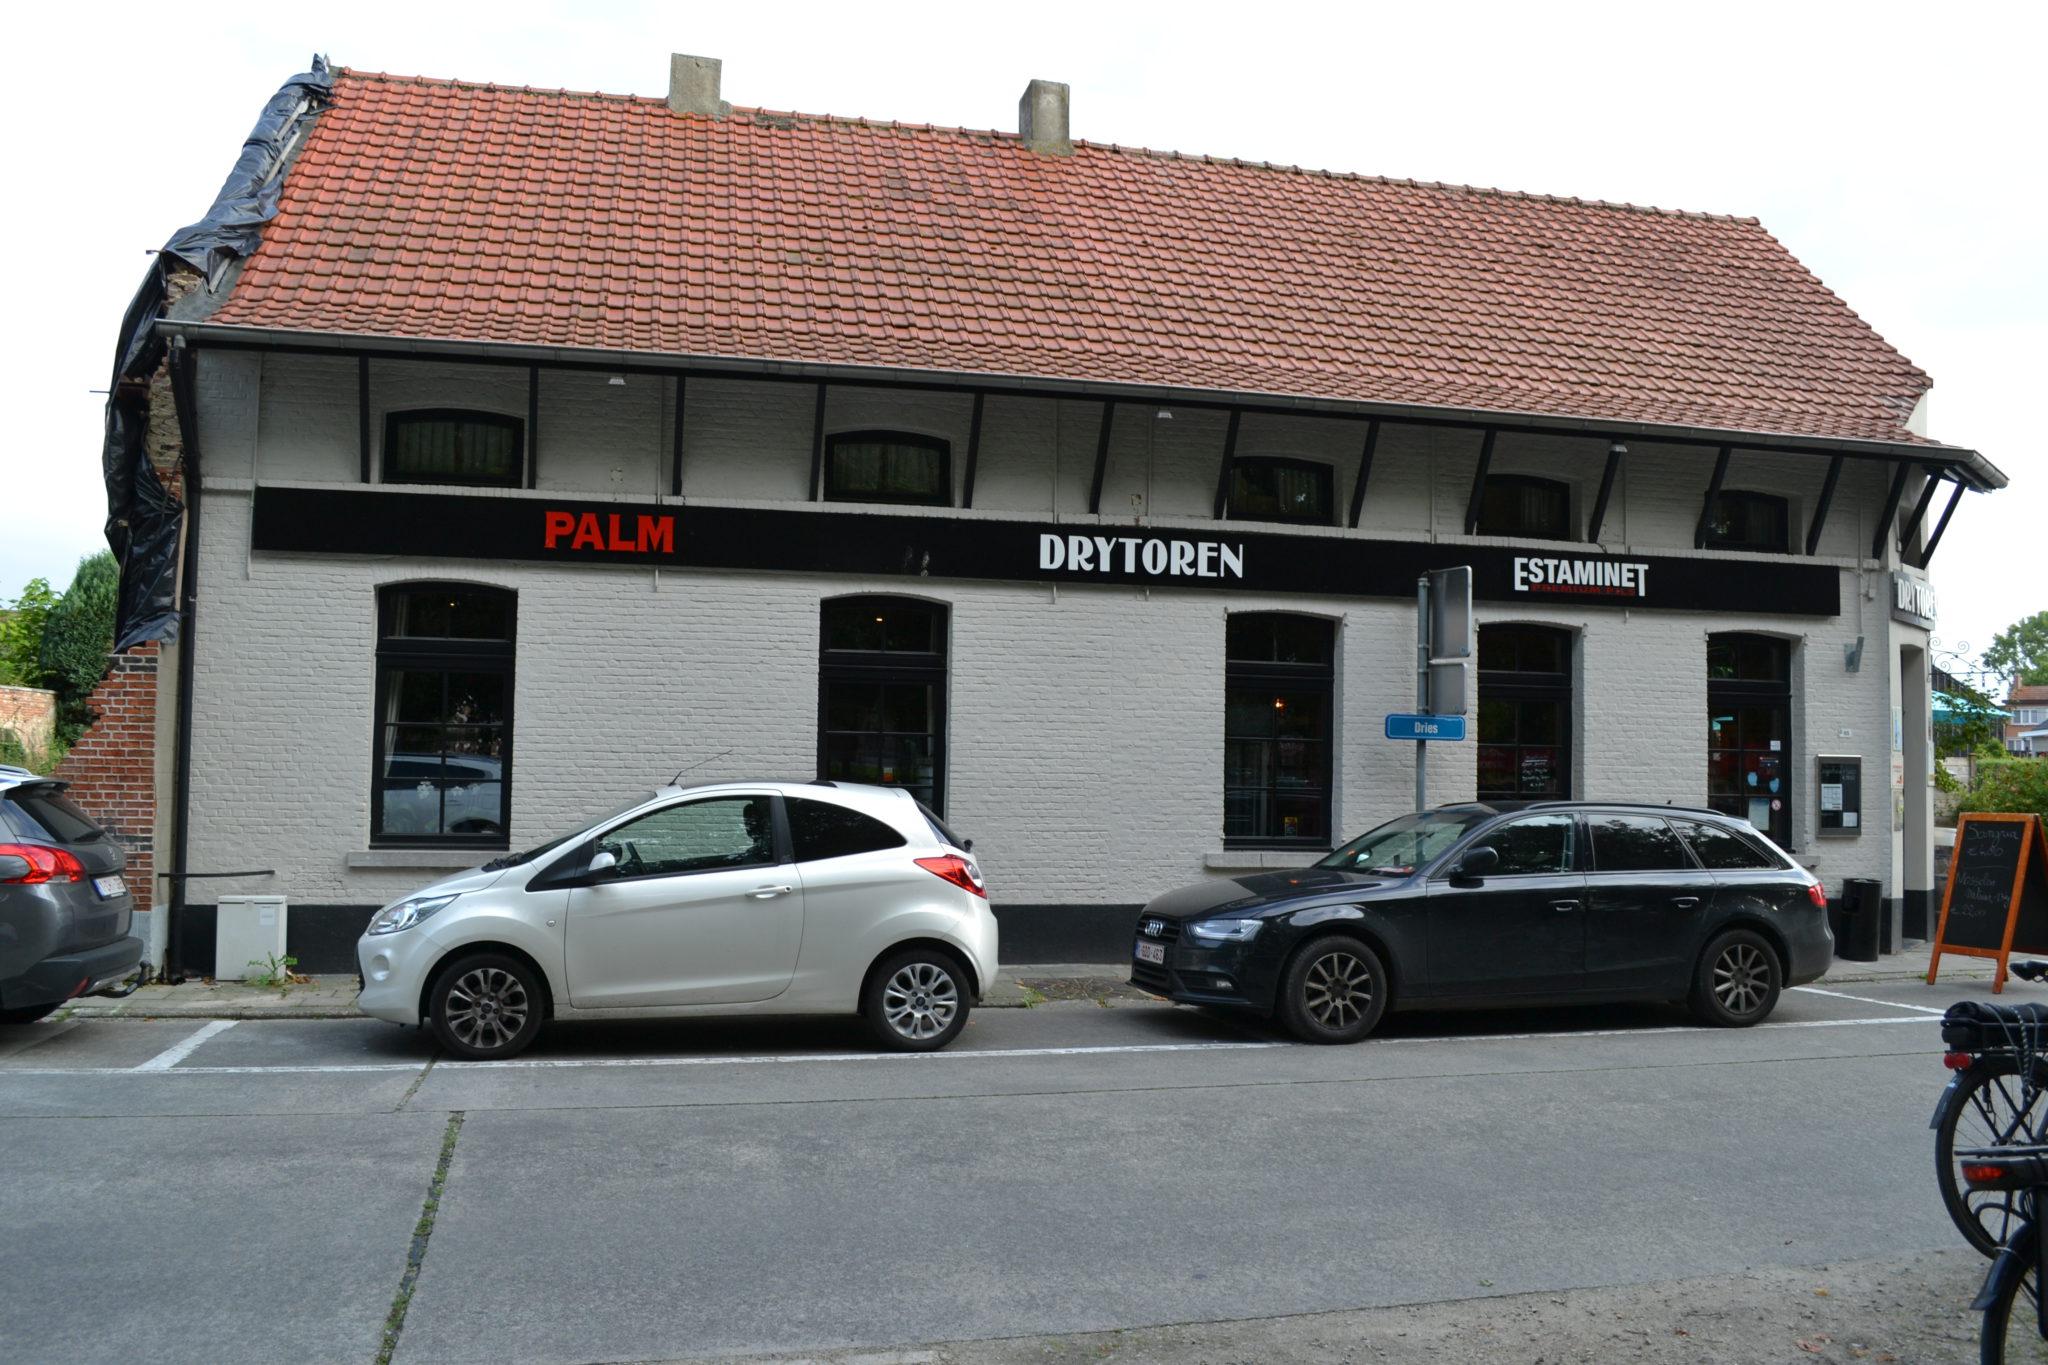 Café-restaurant – feestzaal Drytoren, de zoete inval.